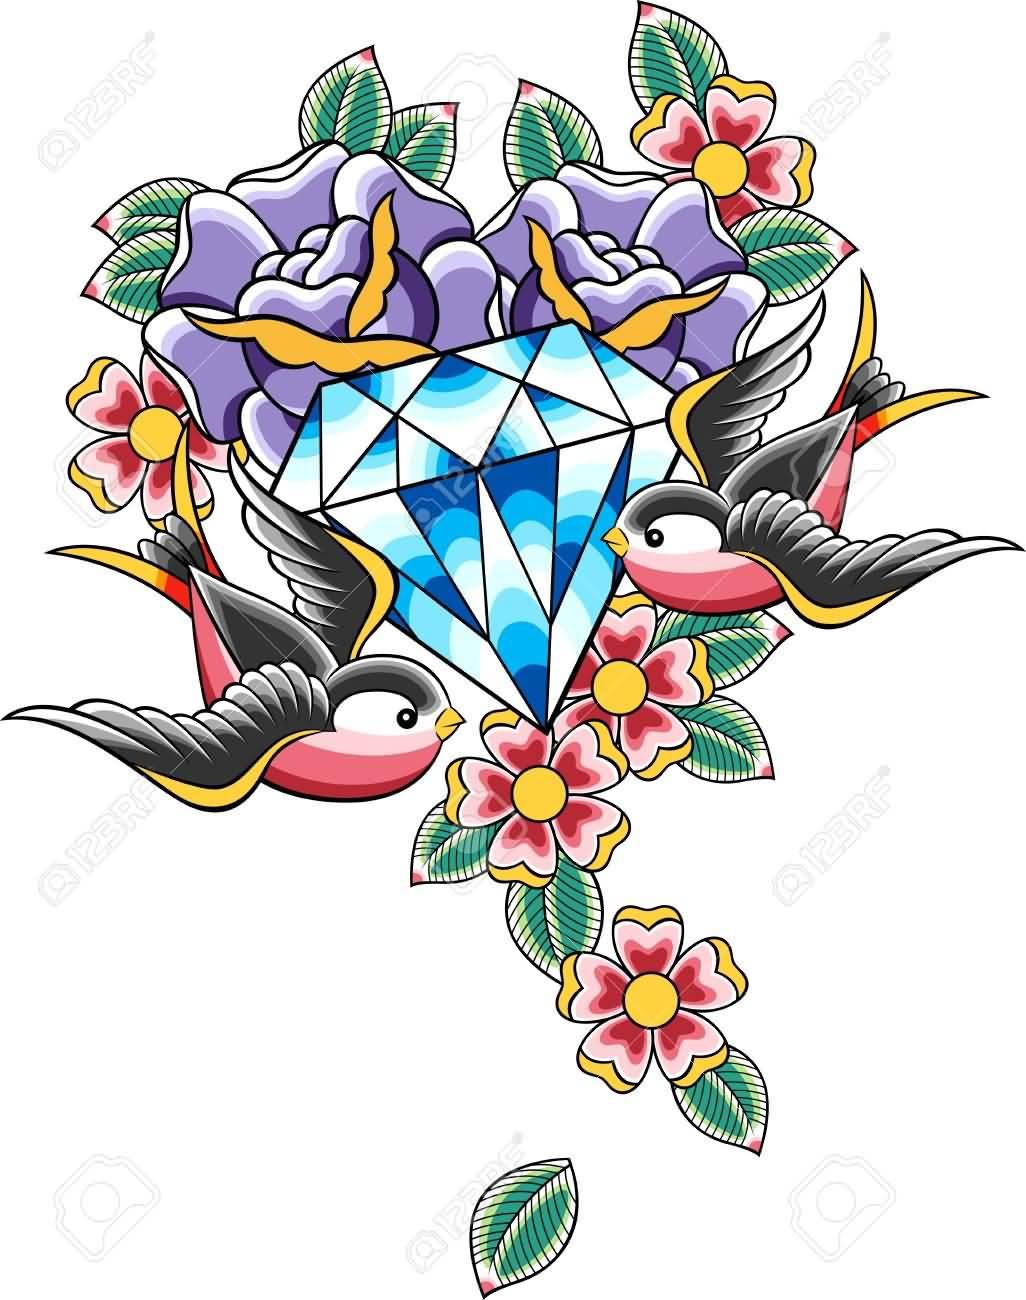 Тату бриллианта с цветами